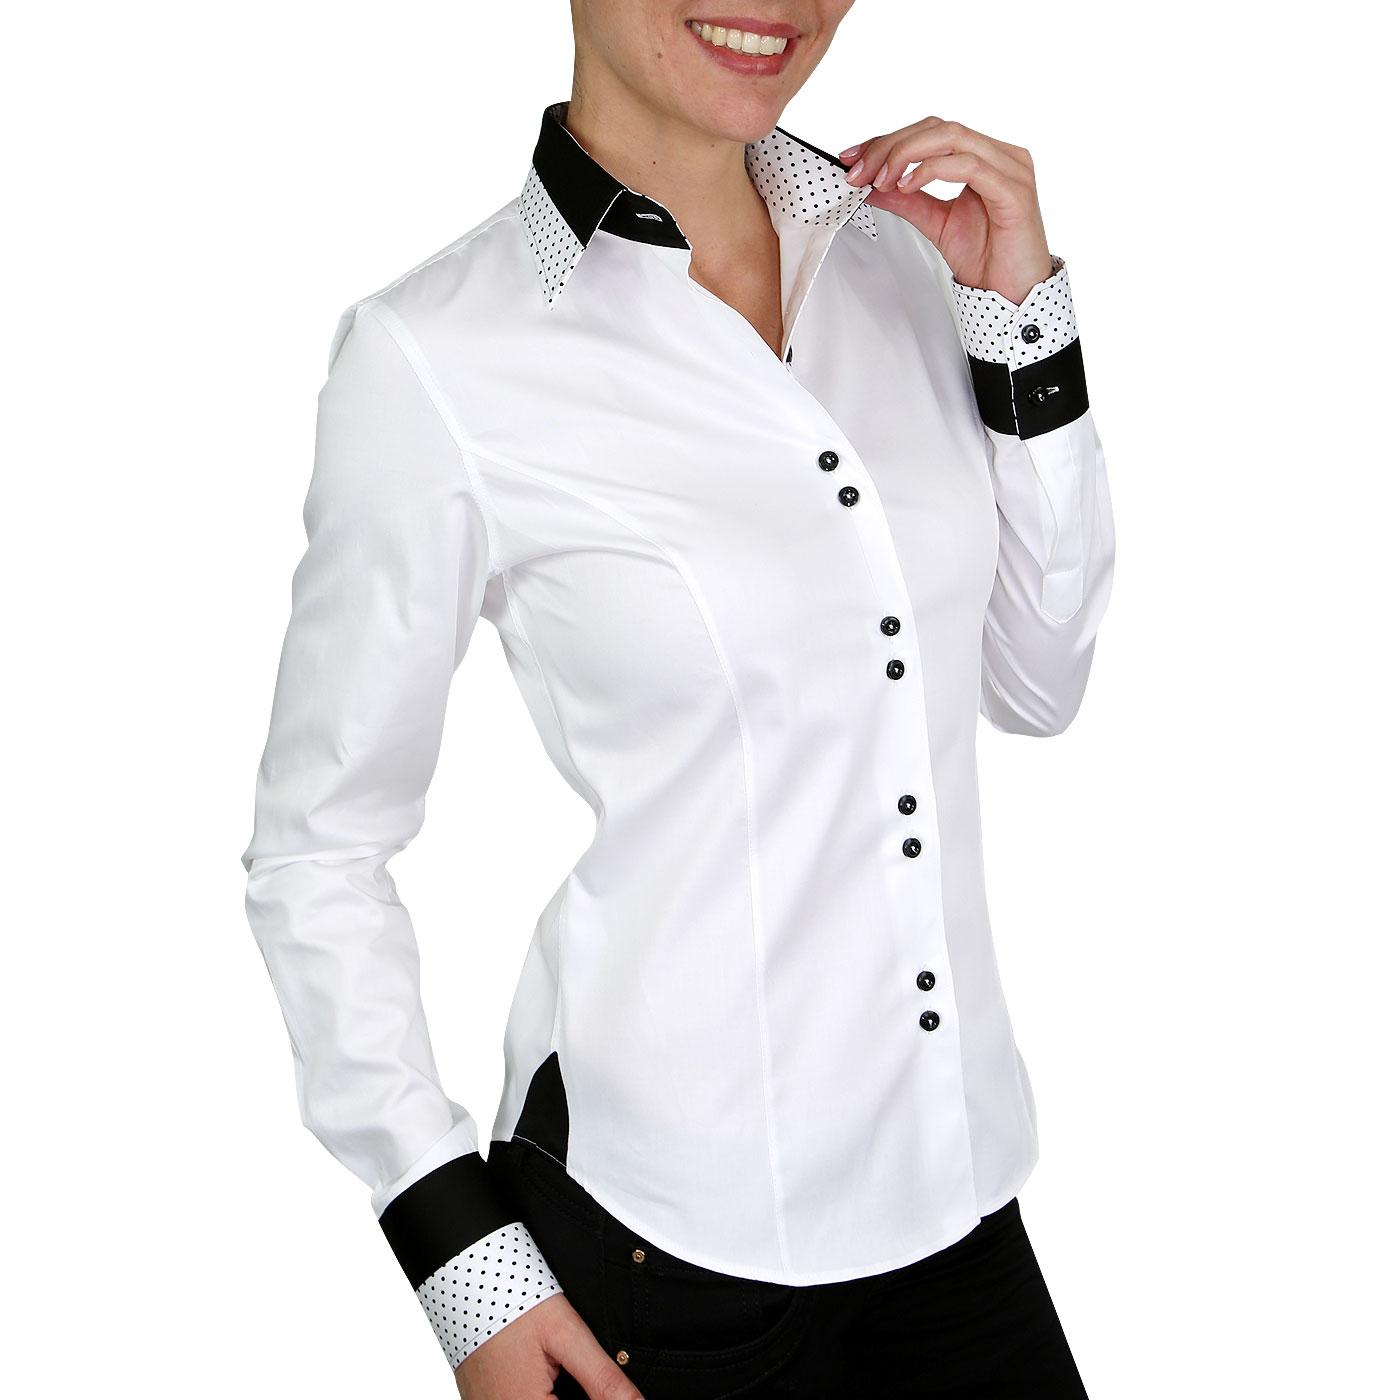 chemise femme mode coupe cintr e par chemiseweb. Black Bedroom Furniture Sets. Home Design Ideas